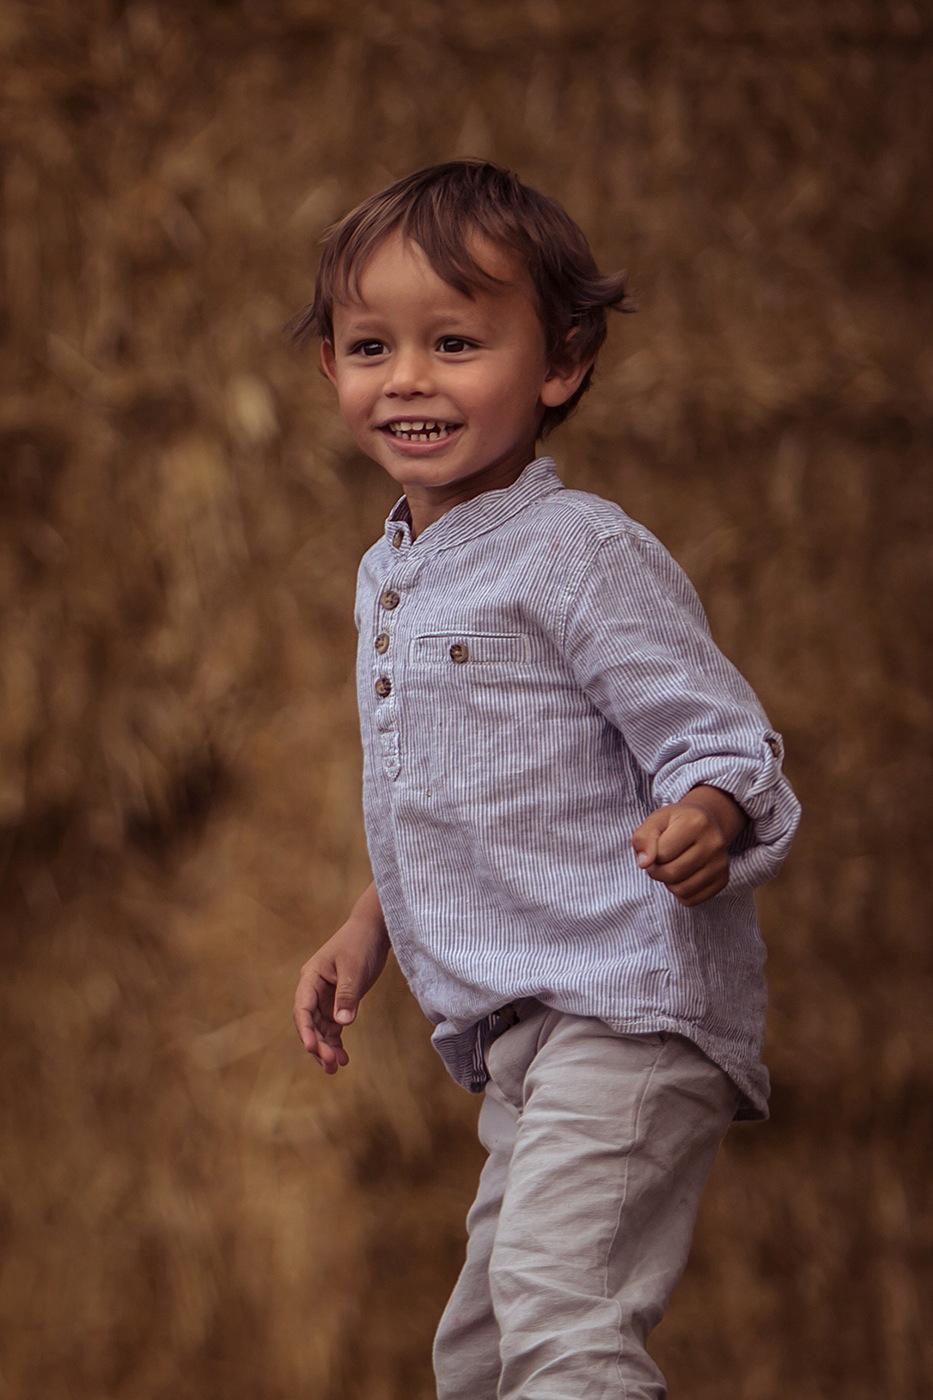 Petit garçon sourire